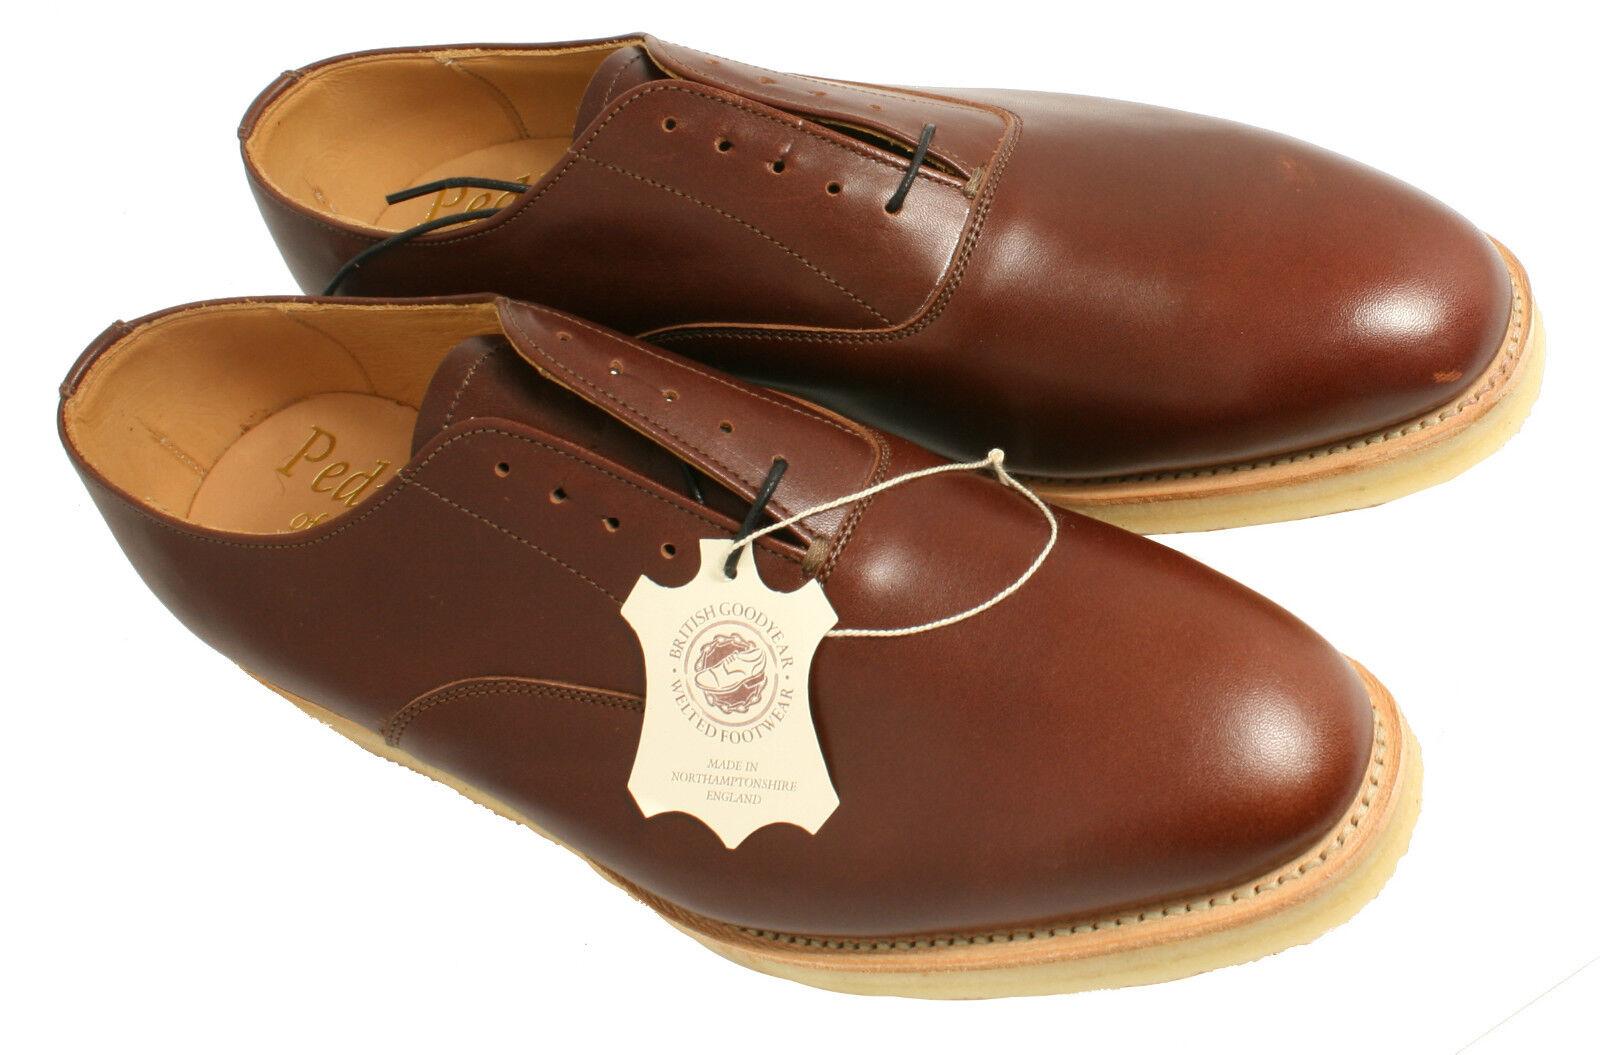 GENTLEMAN'S Lacci Scarpa pediwear Collection Sammy marrone Uk Taglia 9 (EU Taglia 43)